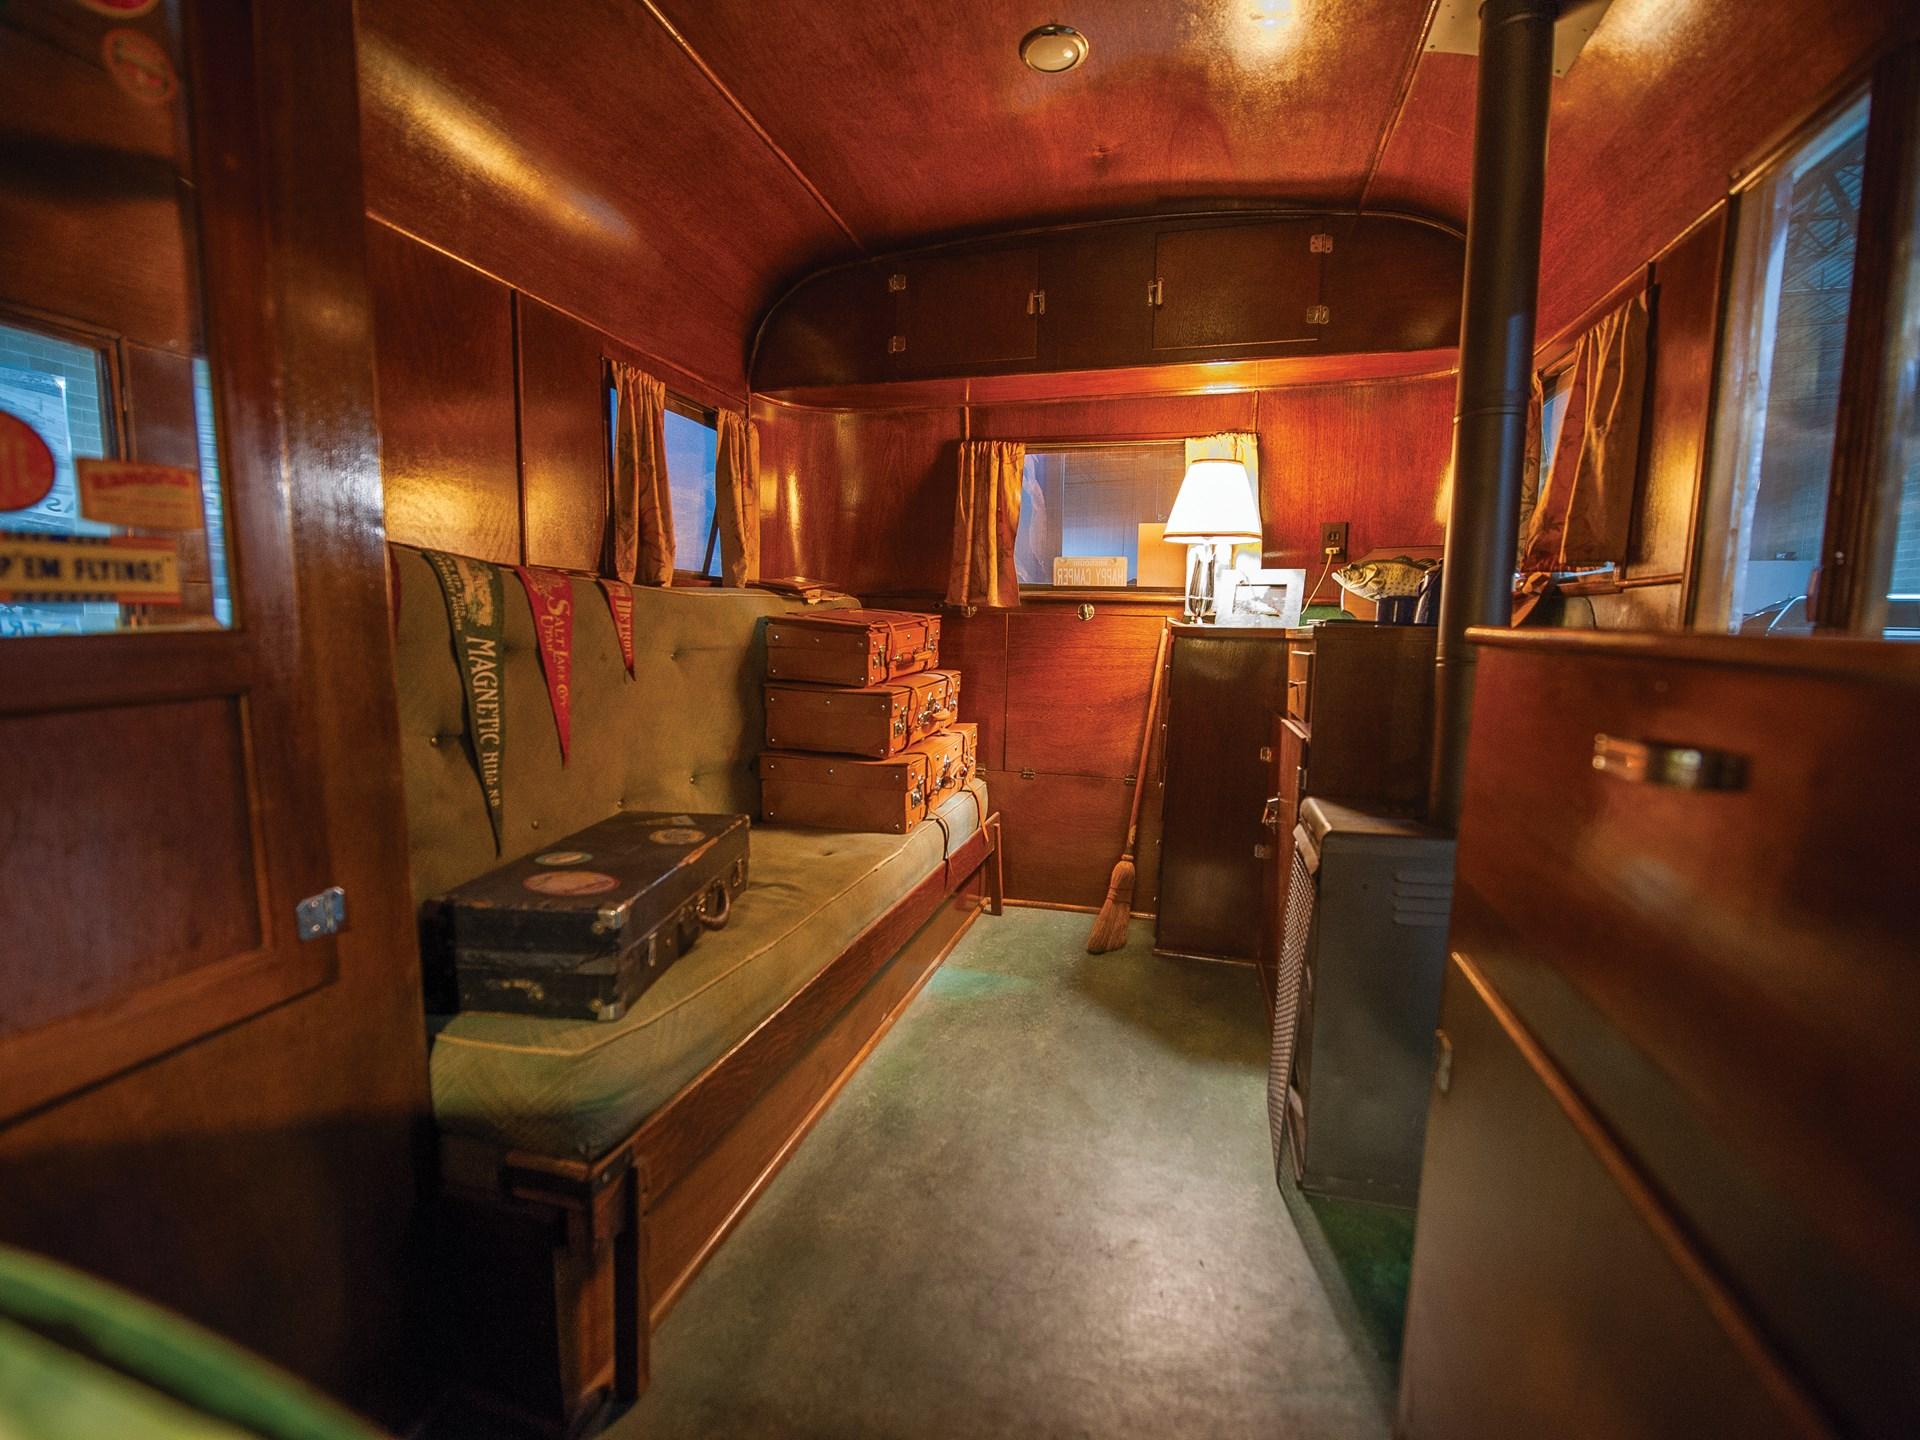 1937 Pierce-Arrow Model C Travelodge interior couch